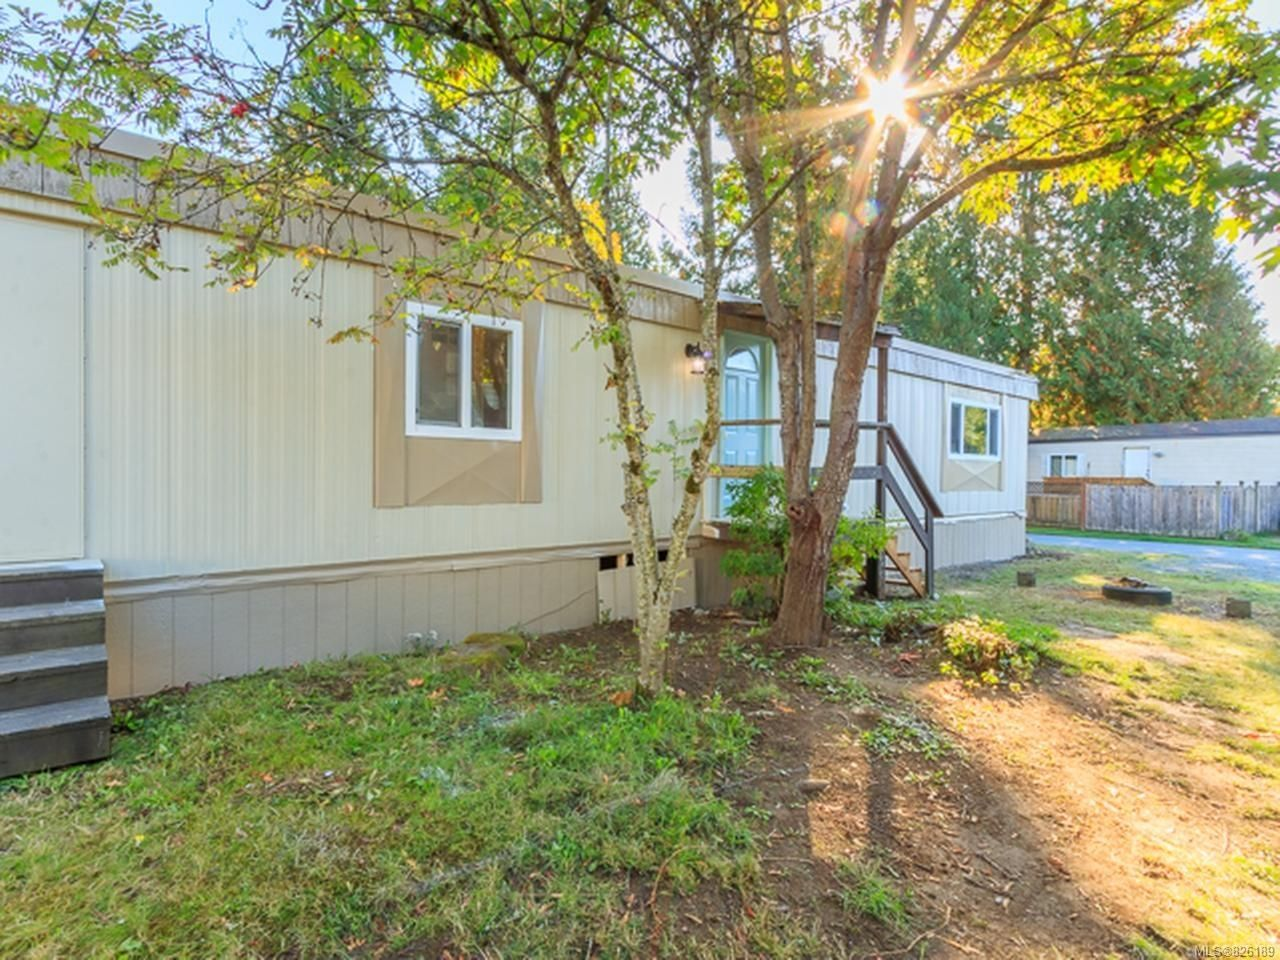 Main Photo: 69 25 MAKI ROAD in NANAIMO: Na Chase River Manufactured Home for sale (Nanaimo)  : MLS®# 826189